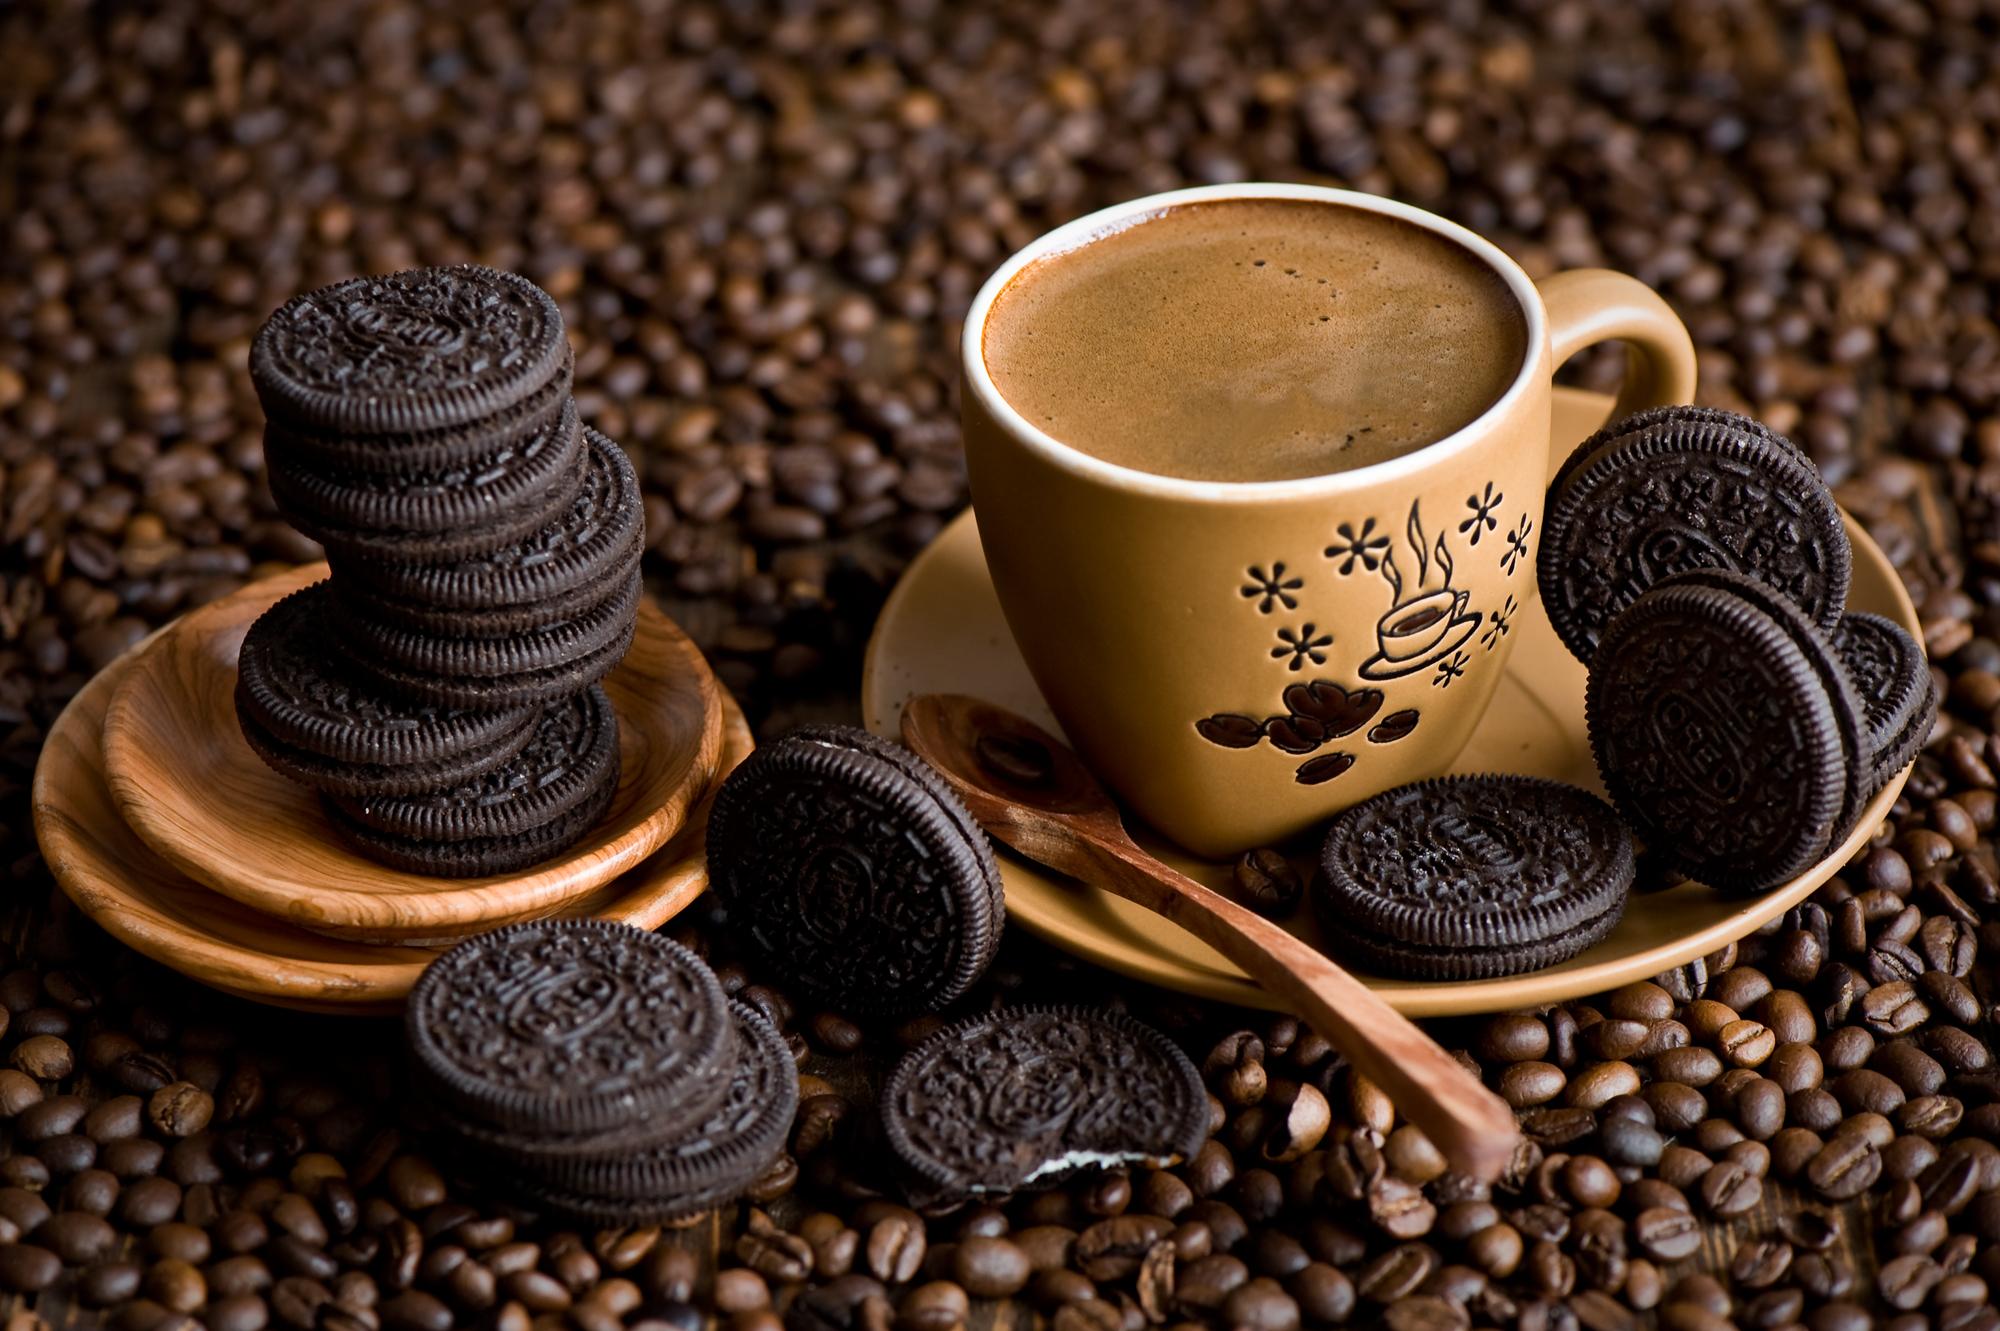 картинки кофе и шоколад фон маски